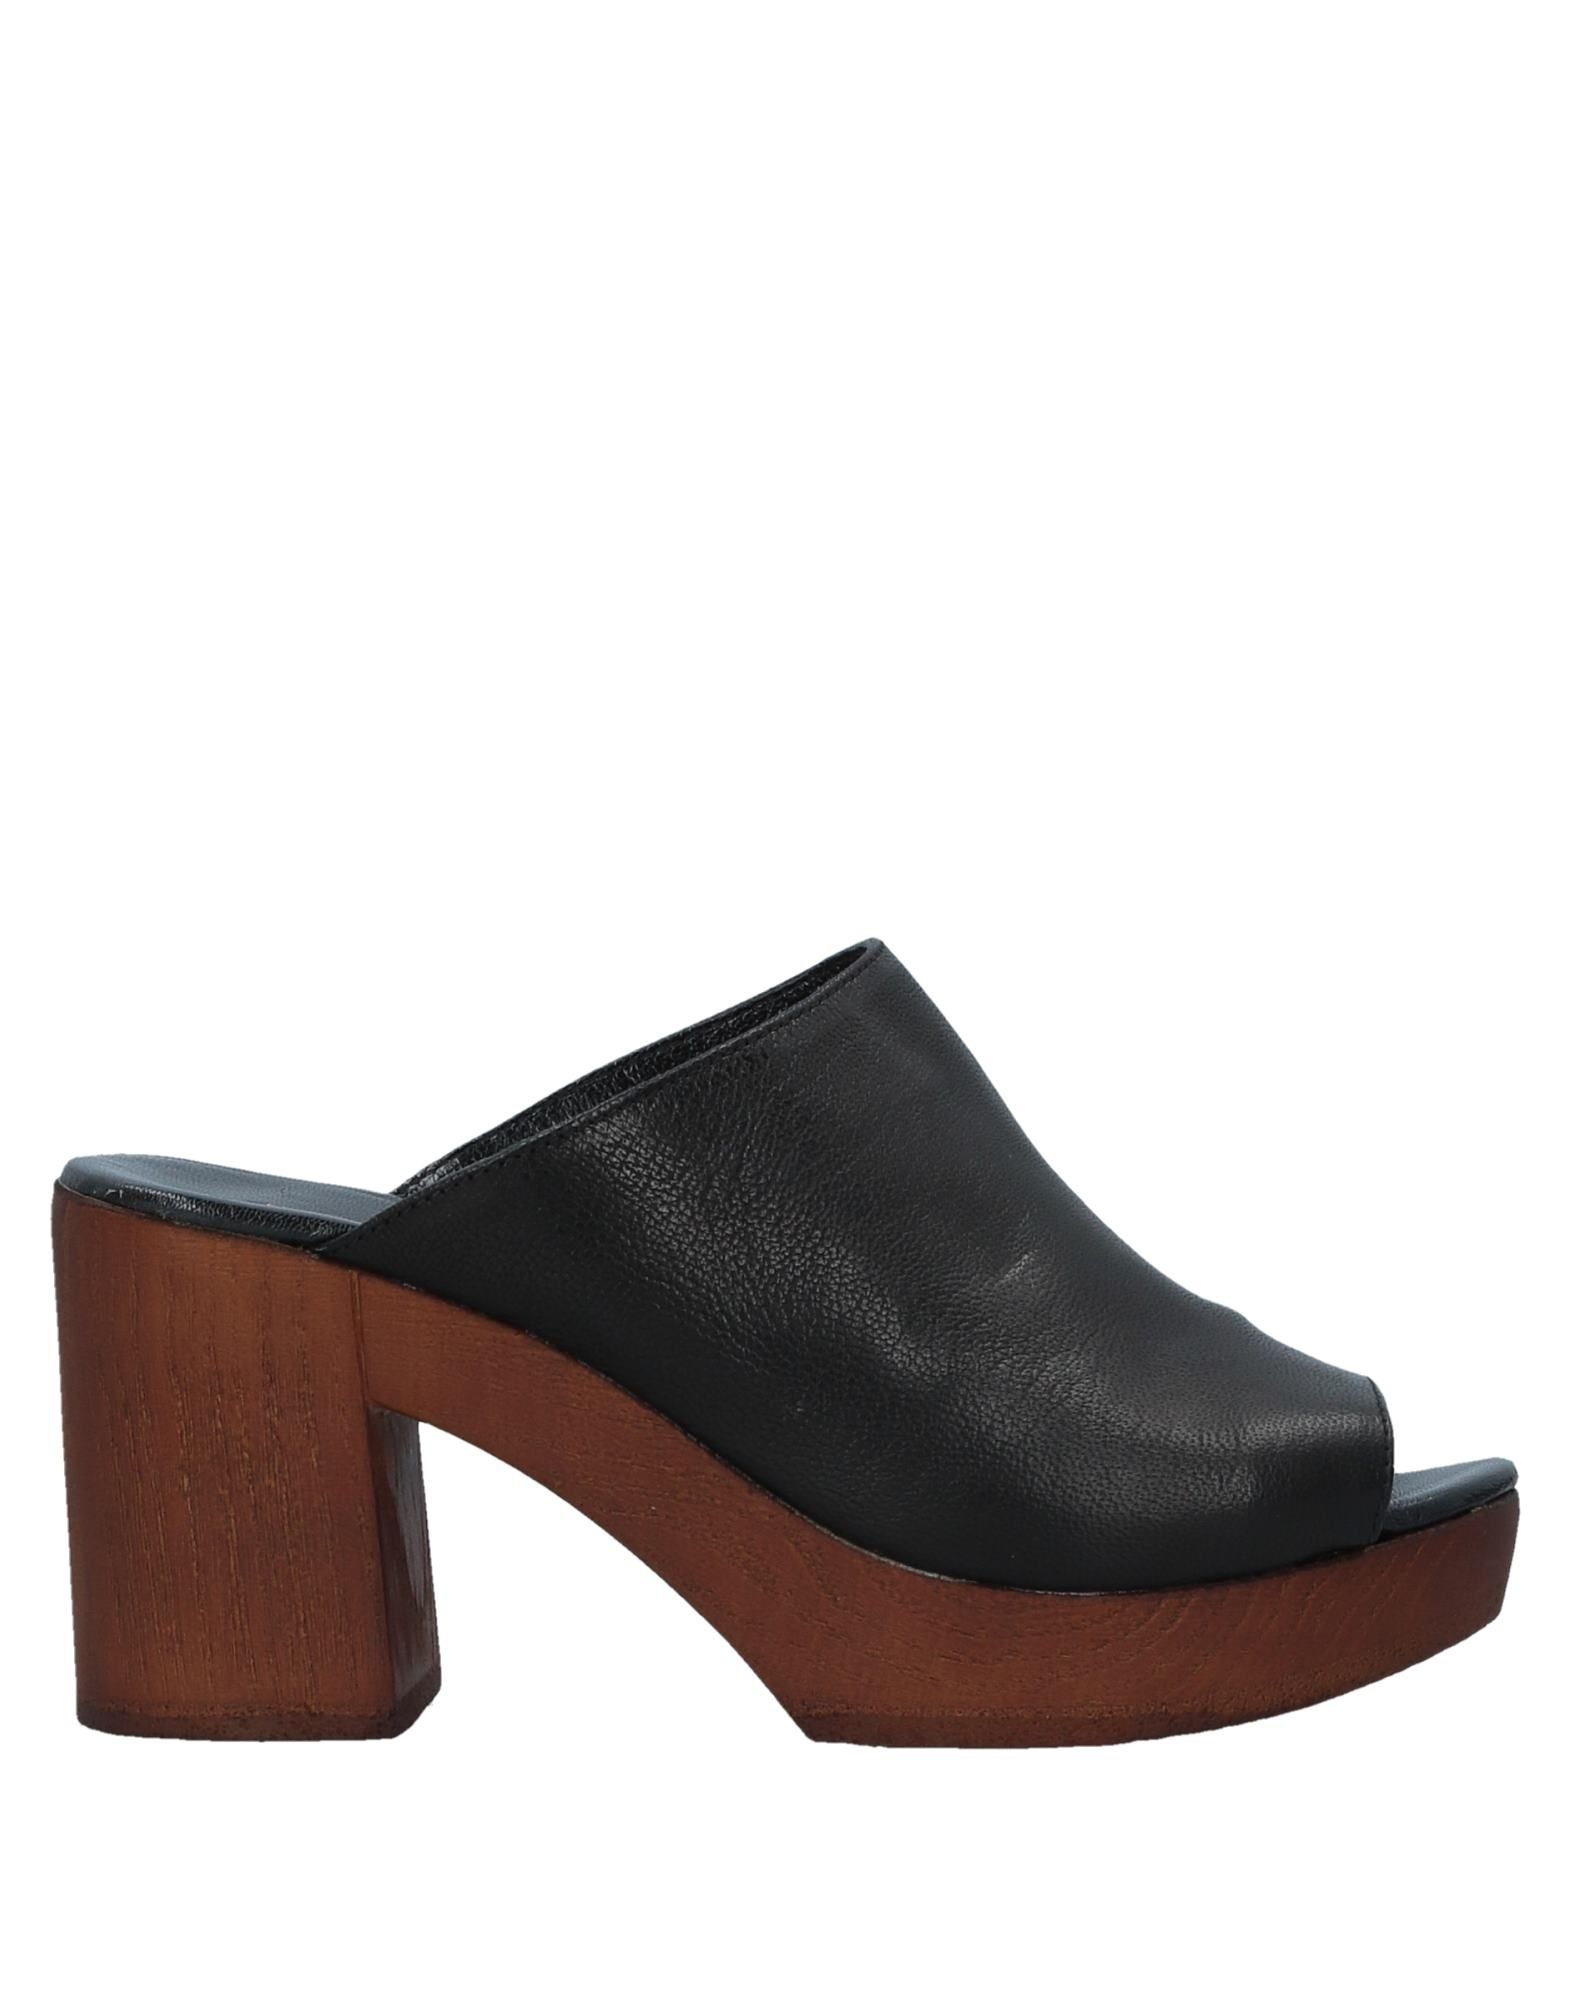 Penelope 11529202LT Pantoletten Damen  11529202LT Penelope Gute Qualität beliebte Schuhe 2a8c3b